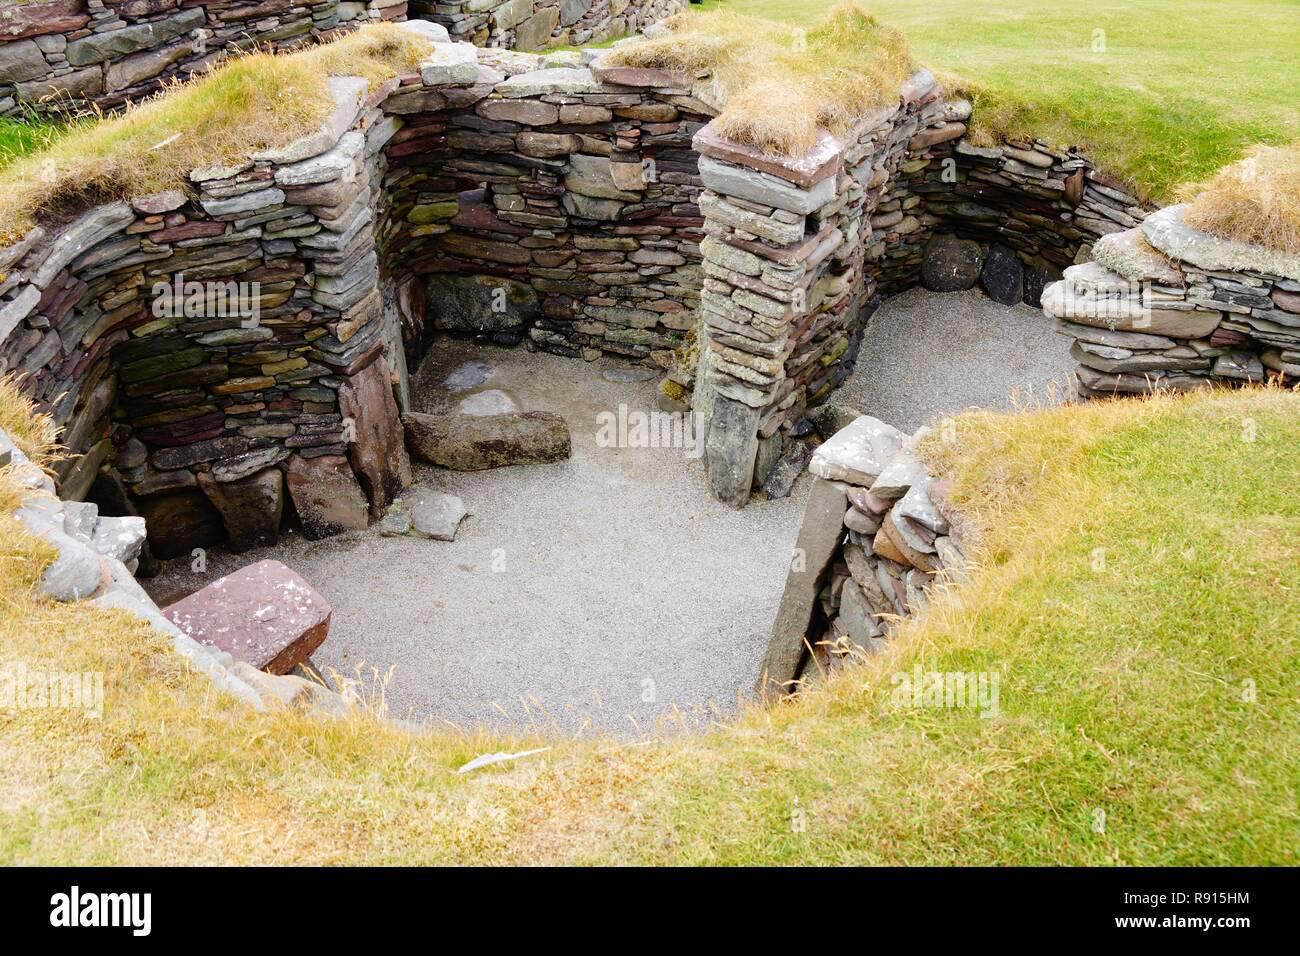 Jarlshof settlement not far from Lerwick. Settled from approximately 2500 to 17th century Stock Photo